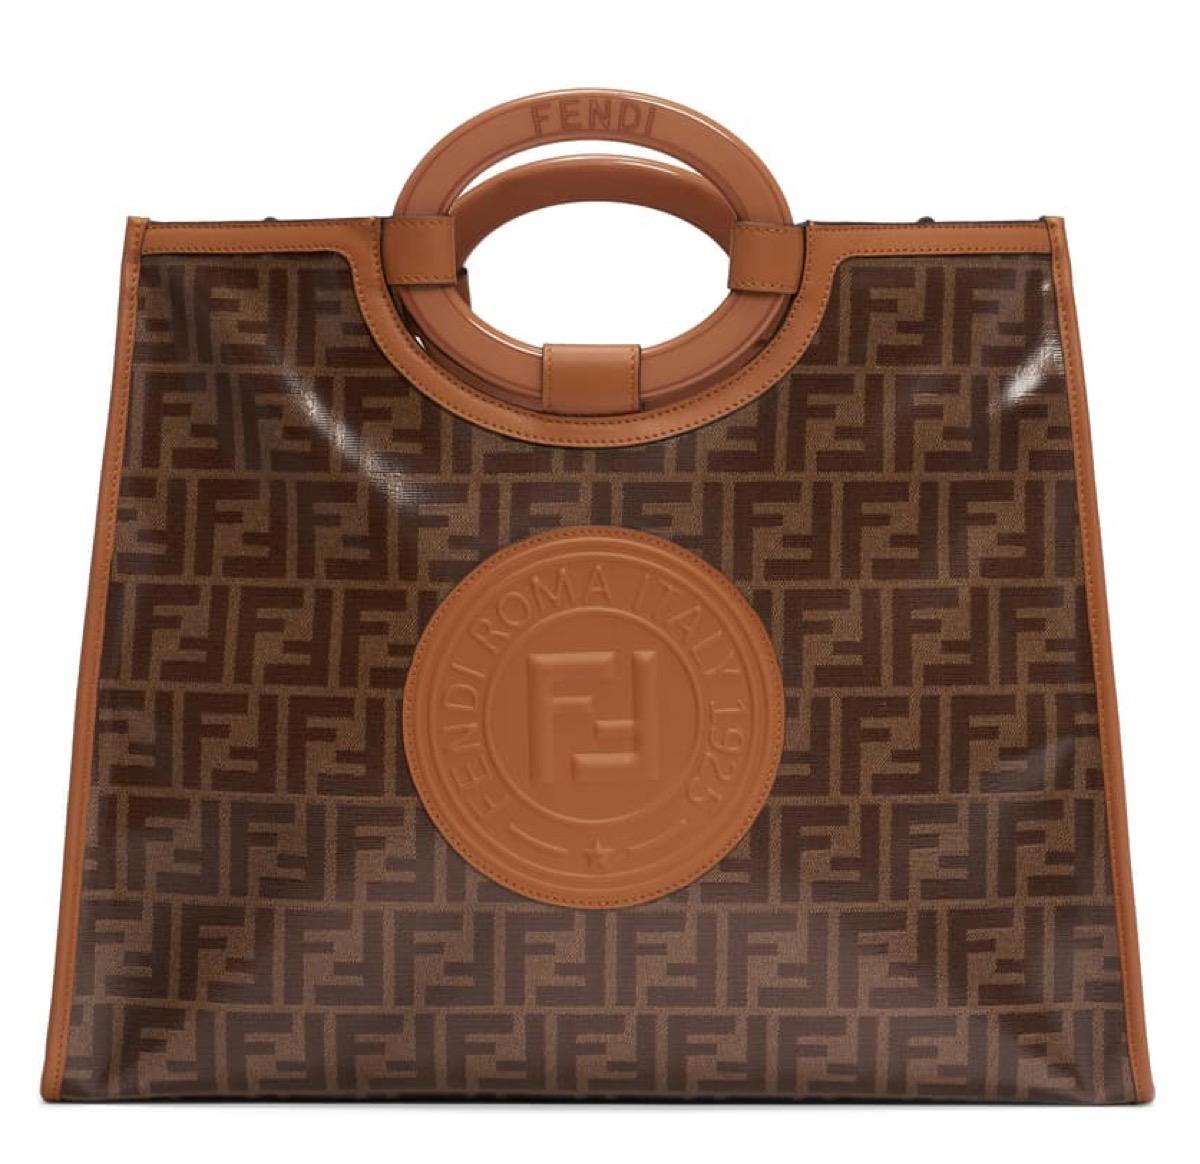 Fendi tote, luxury beach bags